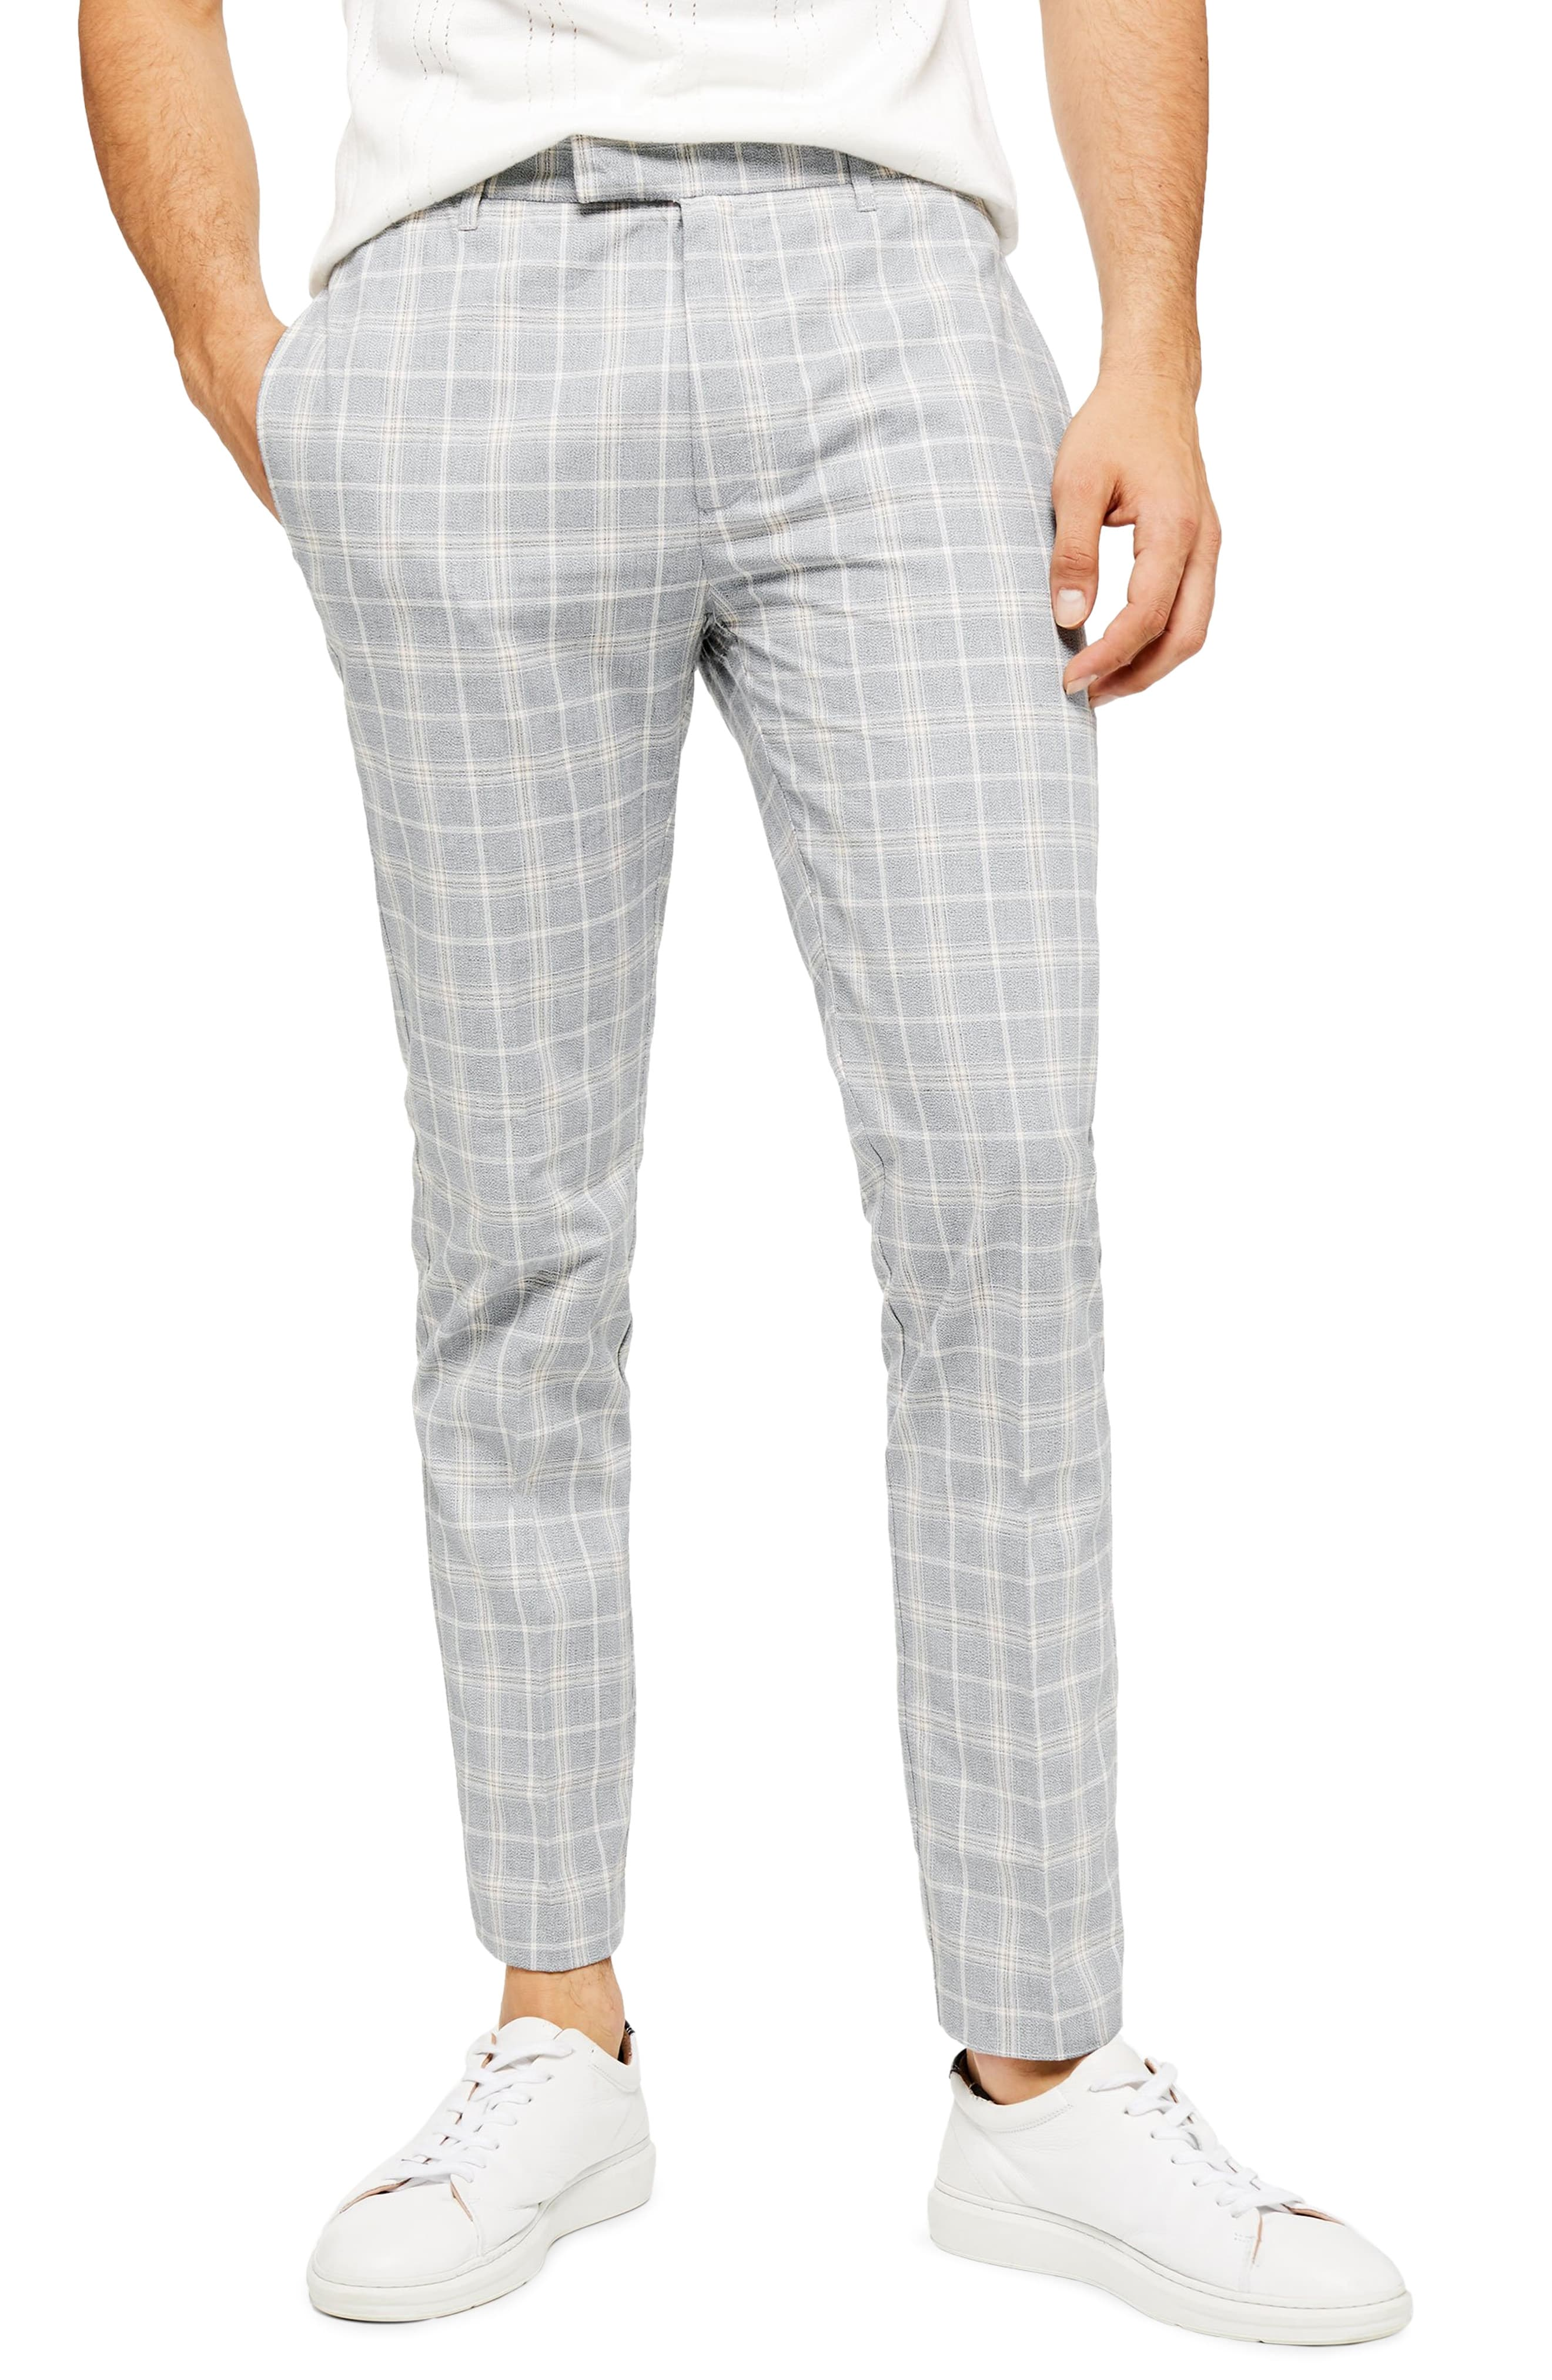 99e1e1c23f Men's Topman Myth Check Skinny Fit Trousers, Size 28 x 32 – Grey ...